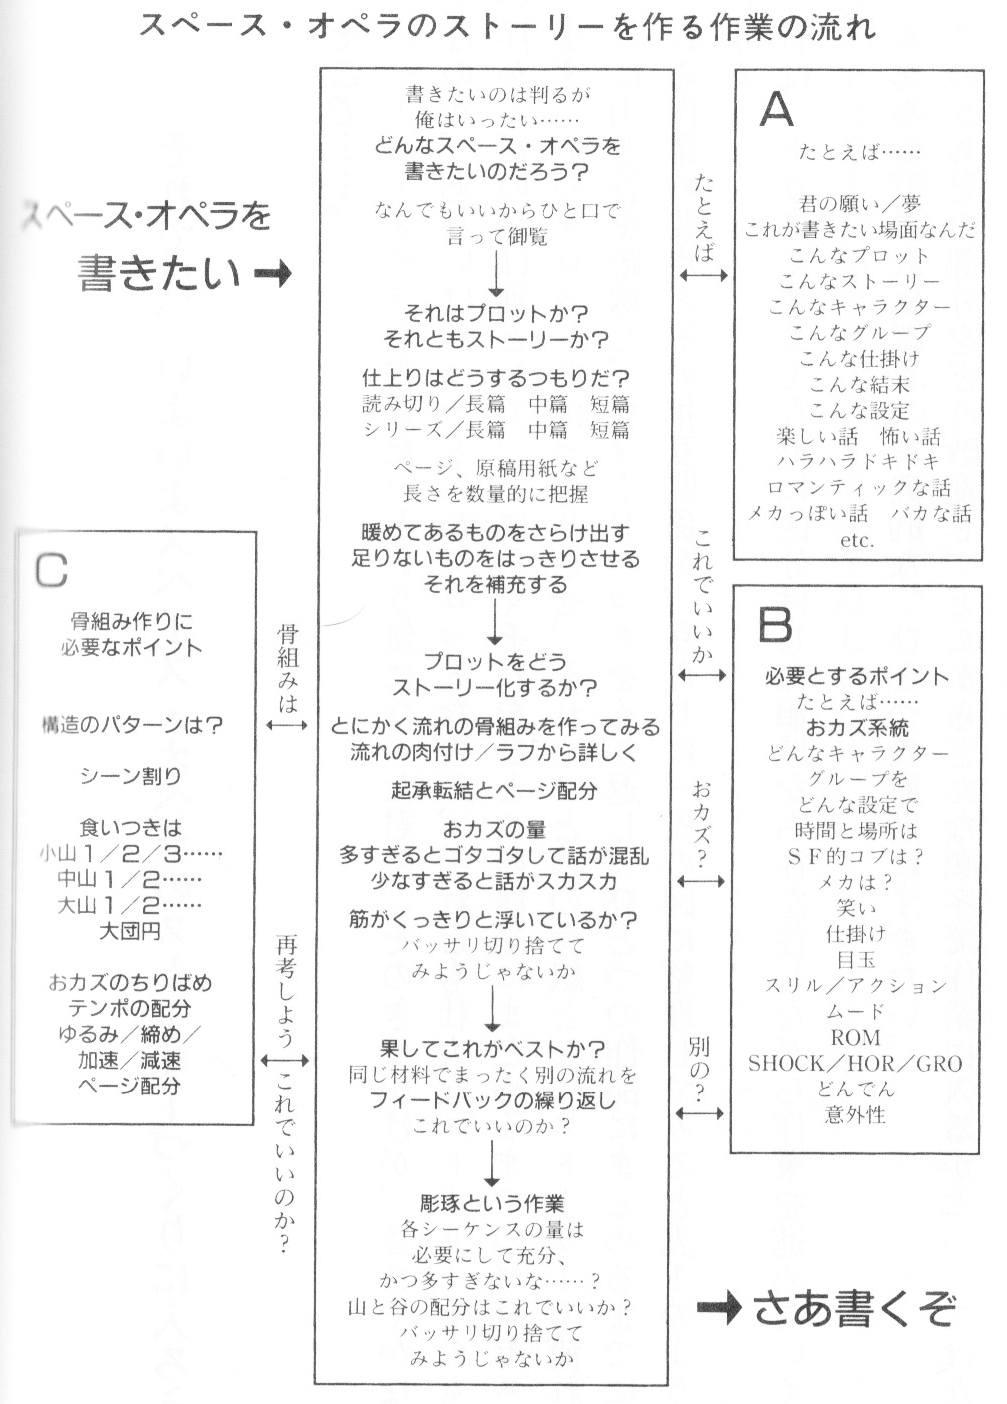 noda_flow.jpg